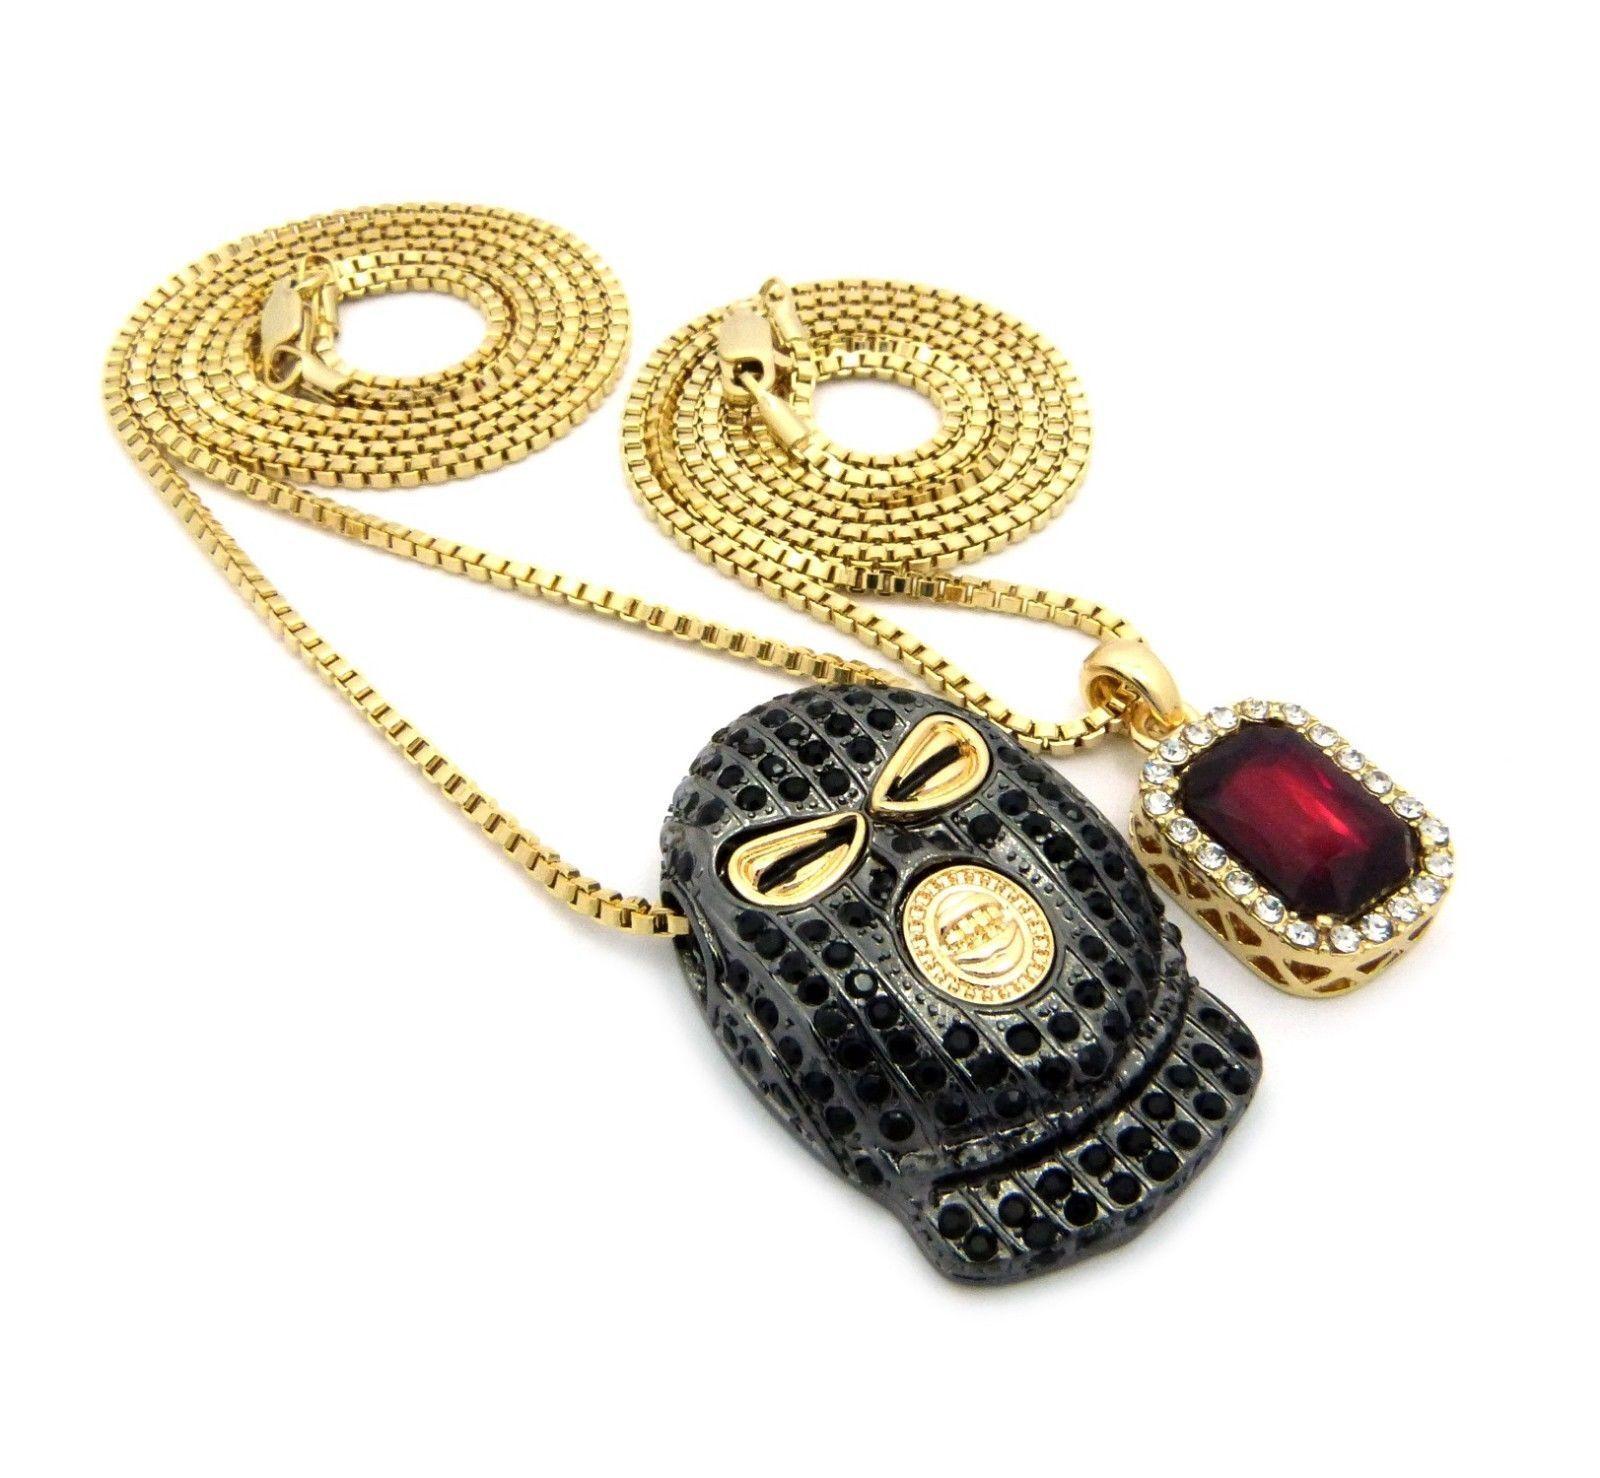 Hip Hop Red Ruby /& Goon Ski Mask man Pendant w// Box Chain 2 Necklace Set RC1274